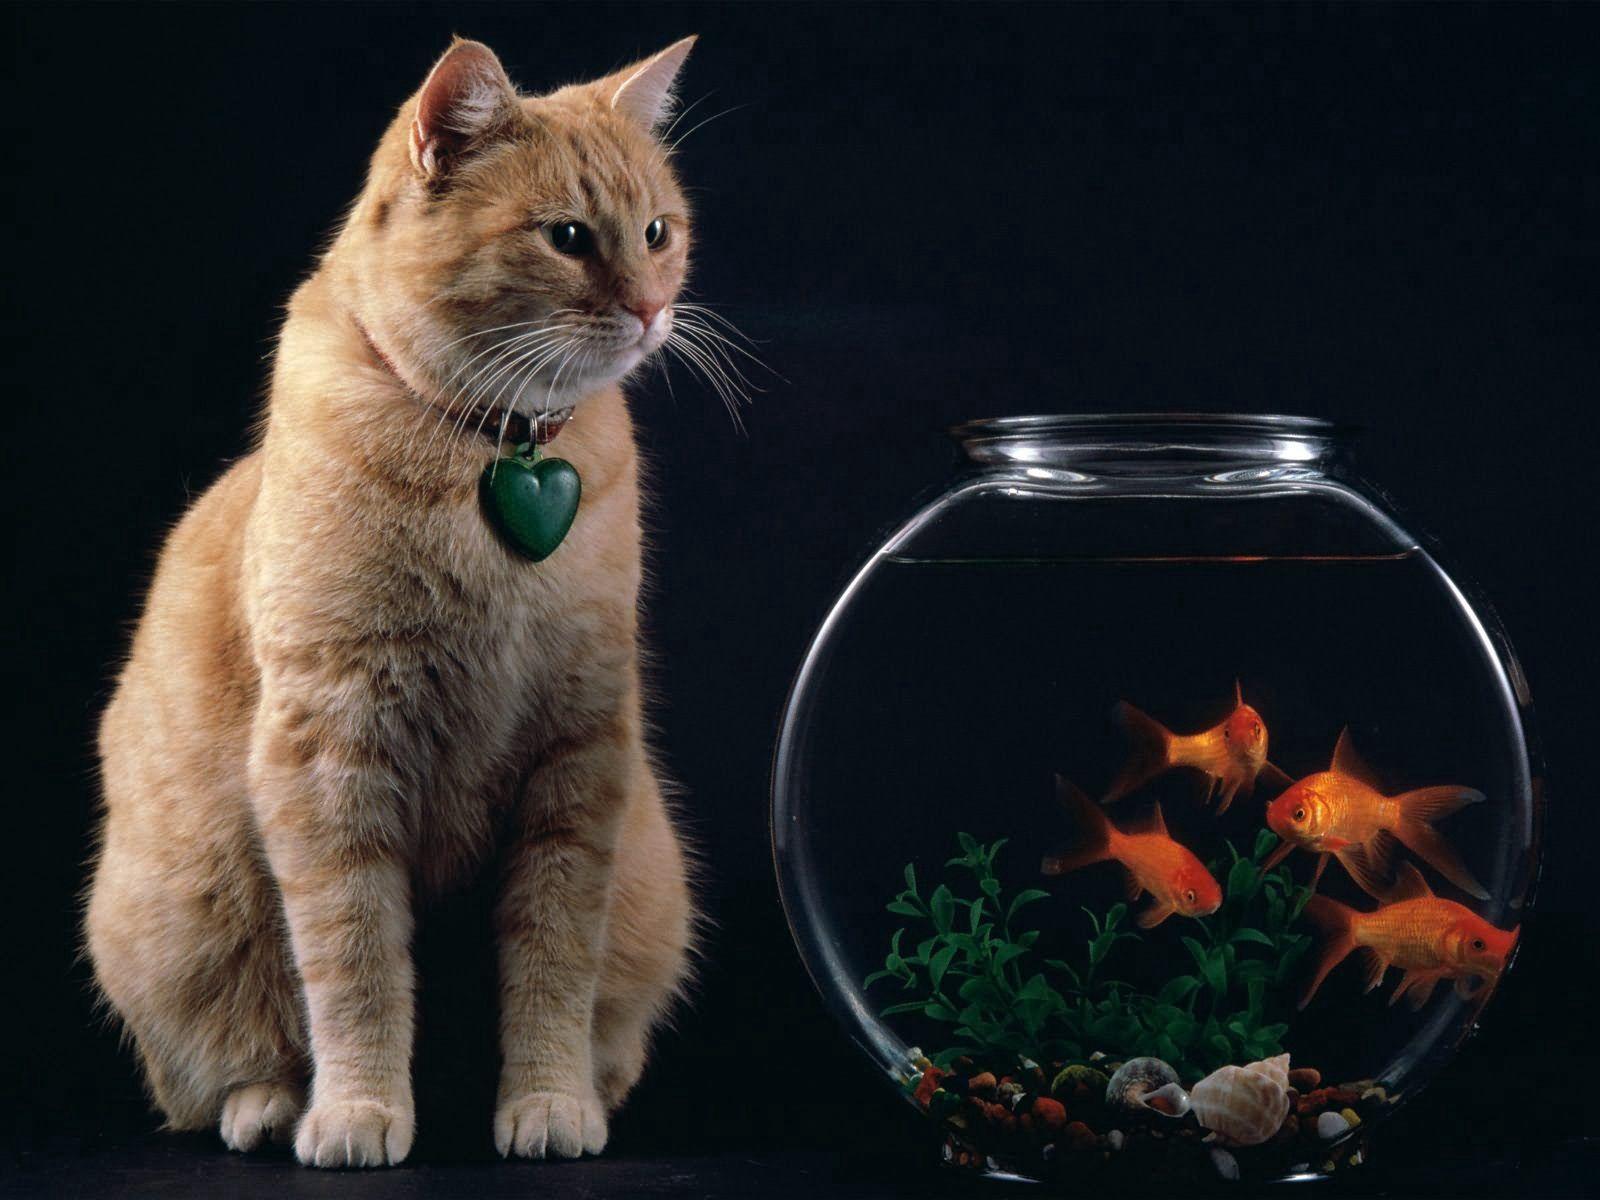 96559 Screensavers and Wallpapers Aquarium for phone. Download Animals, Cat, Aquarium, Fish pictures for free